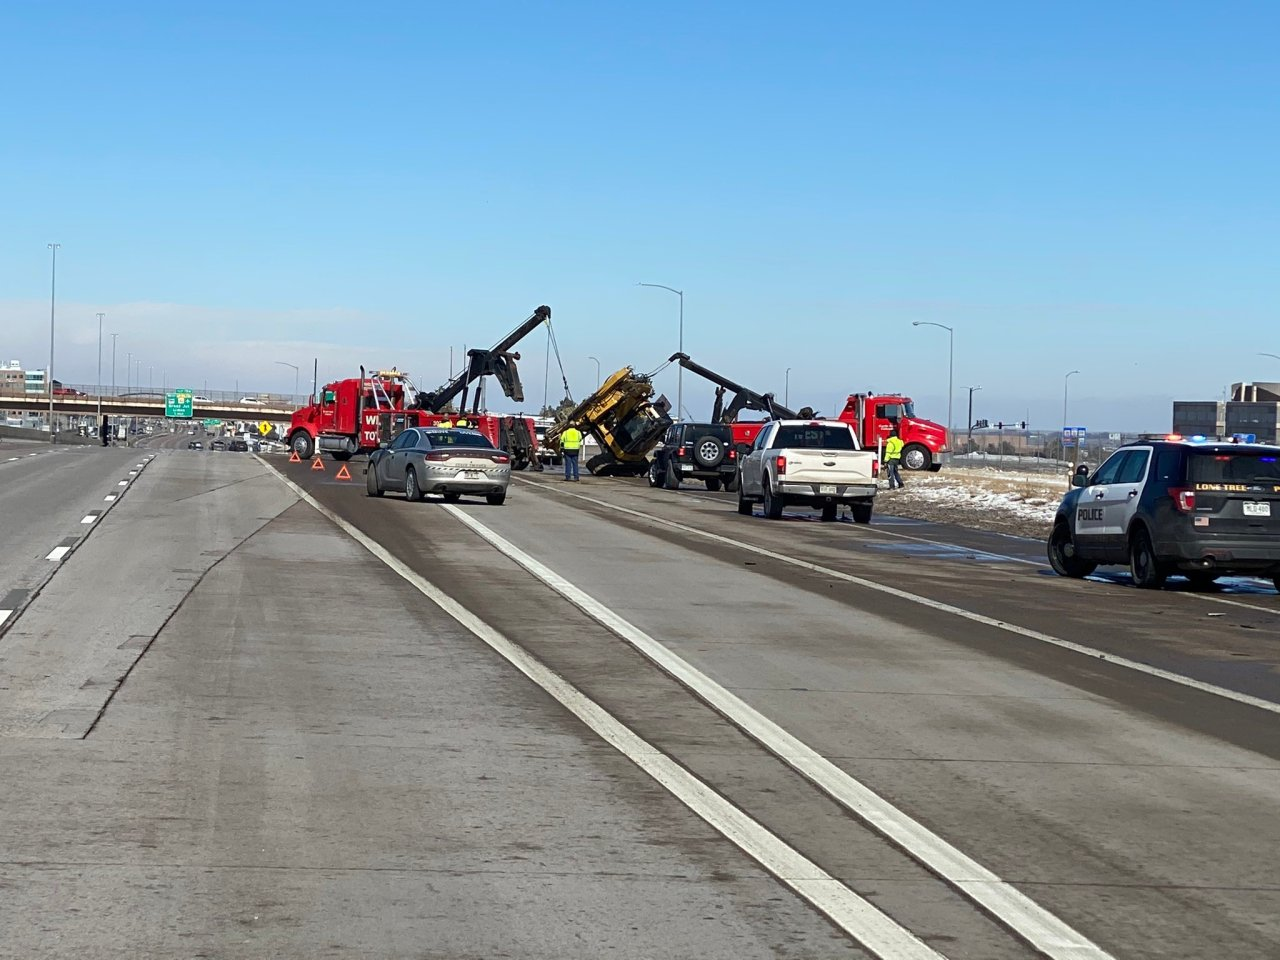 CDOT reopens NB I-25 after emergency bridge repair at Sky Ridge Avenue - FOX 31 Denver